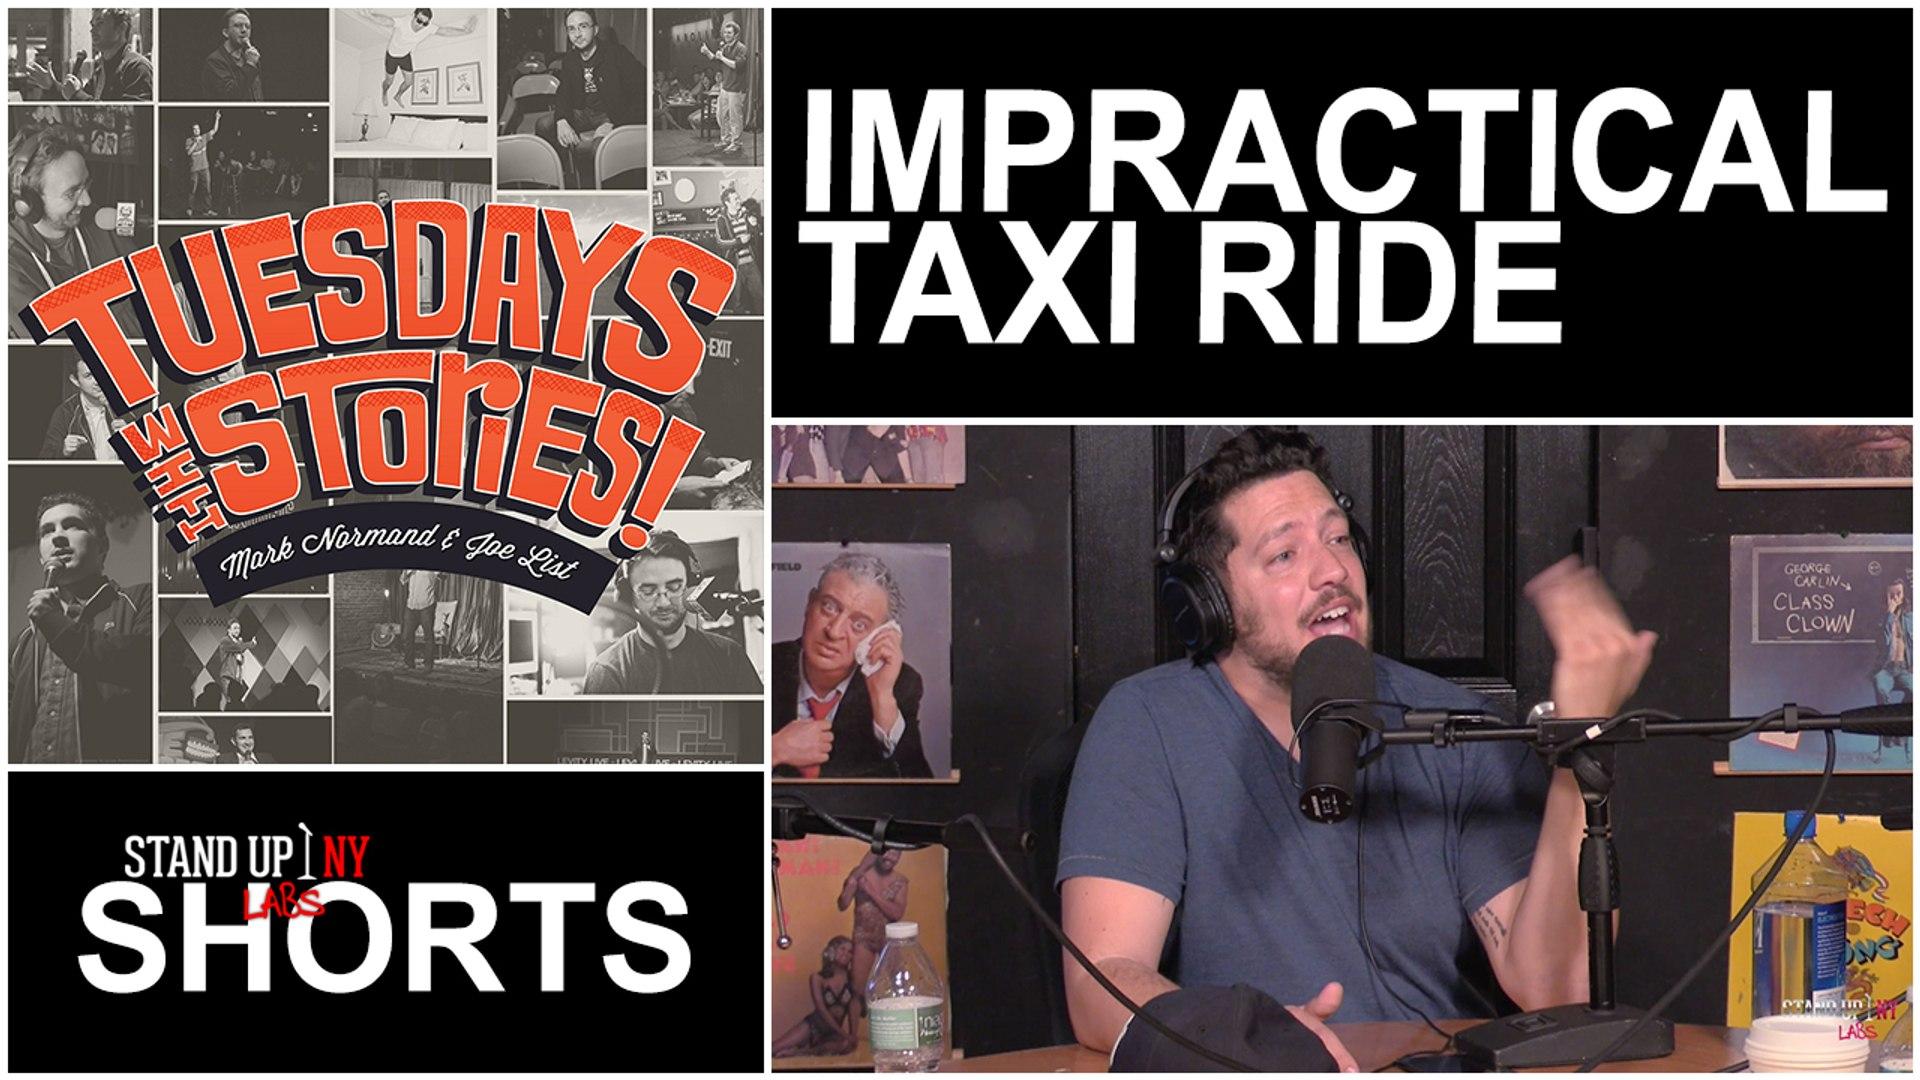 Impractical Taxi Ride